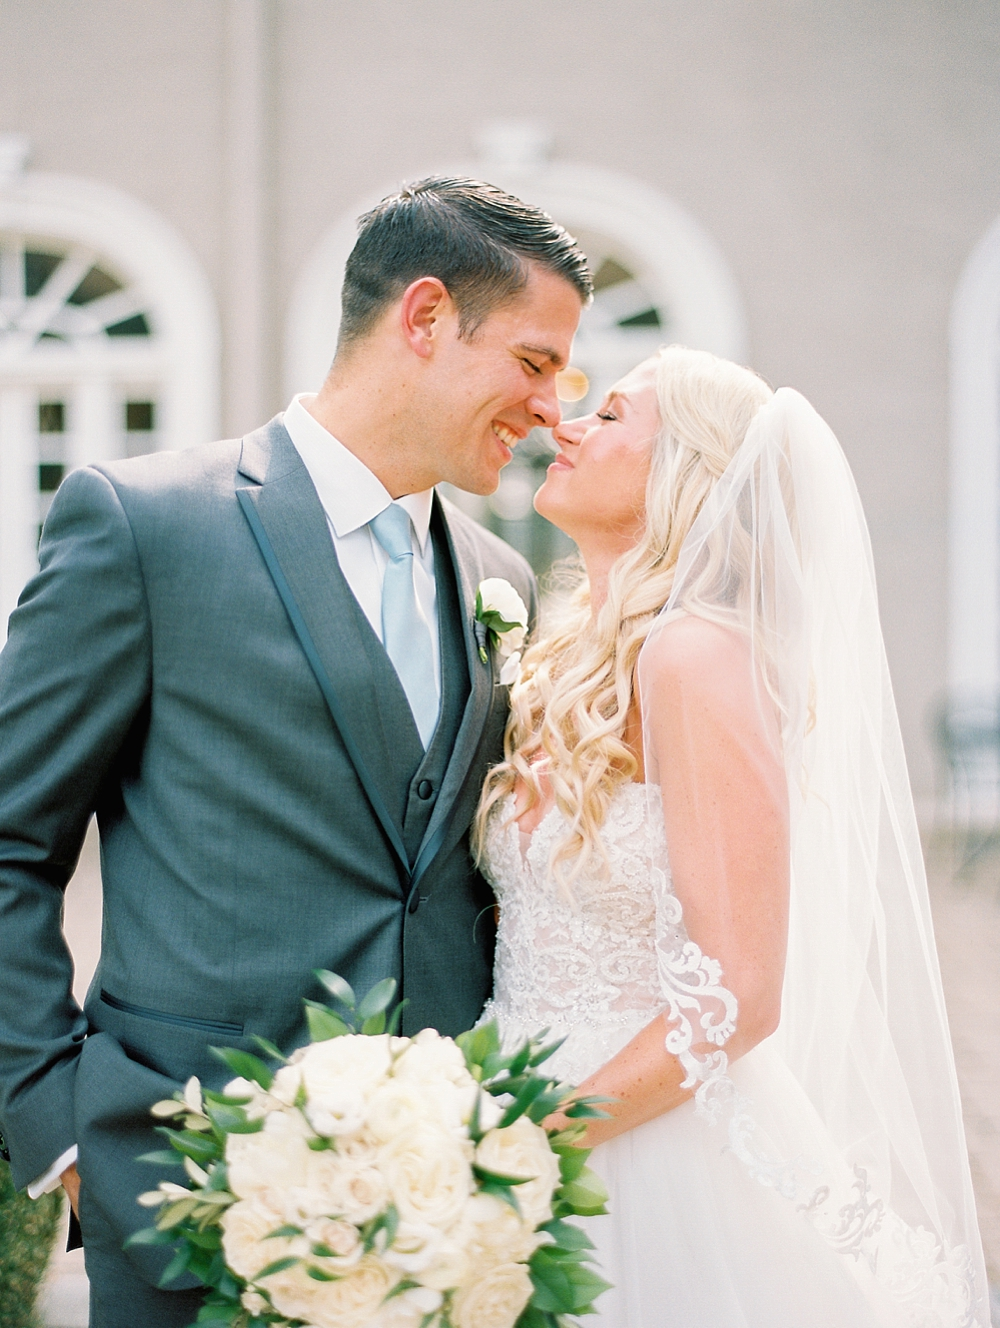 kristin-la-voie-photography-lehmann-mansion-wedding-photographer-32